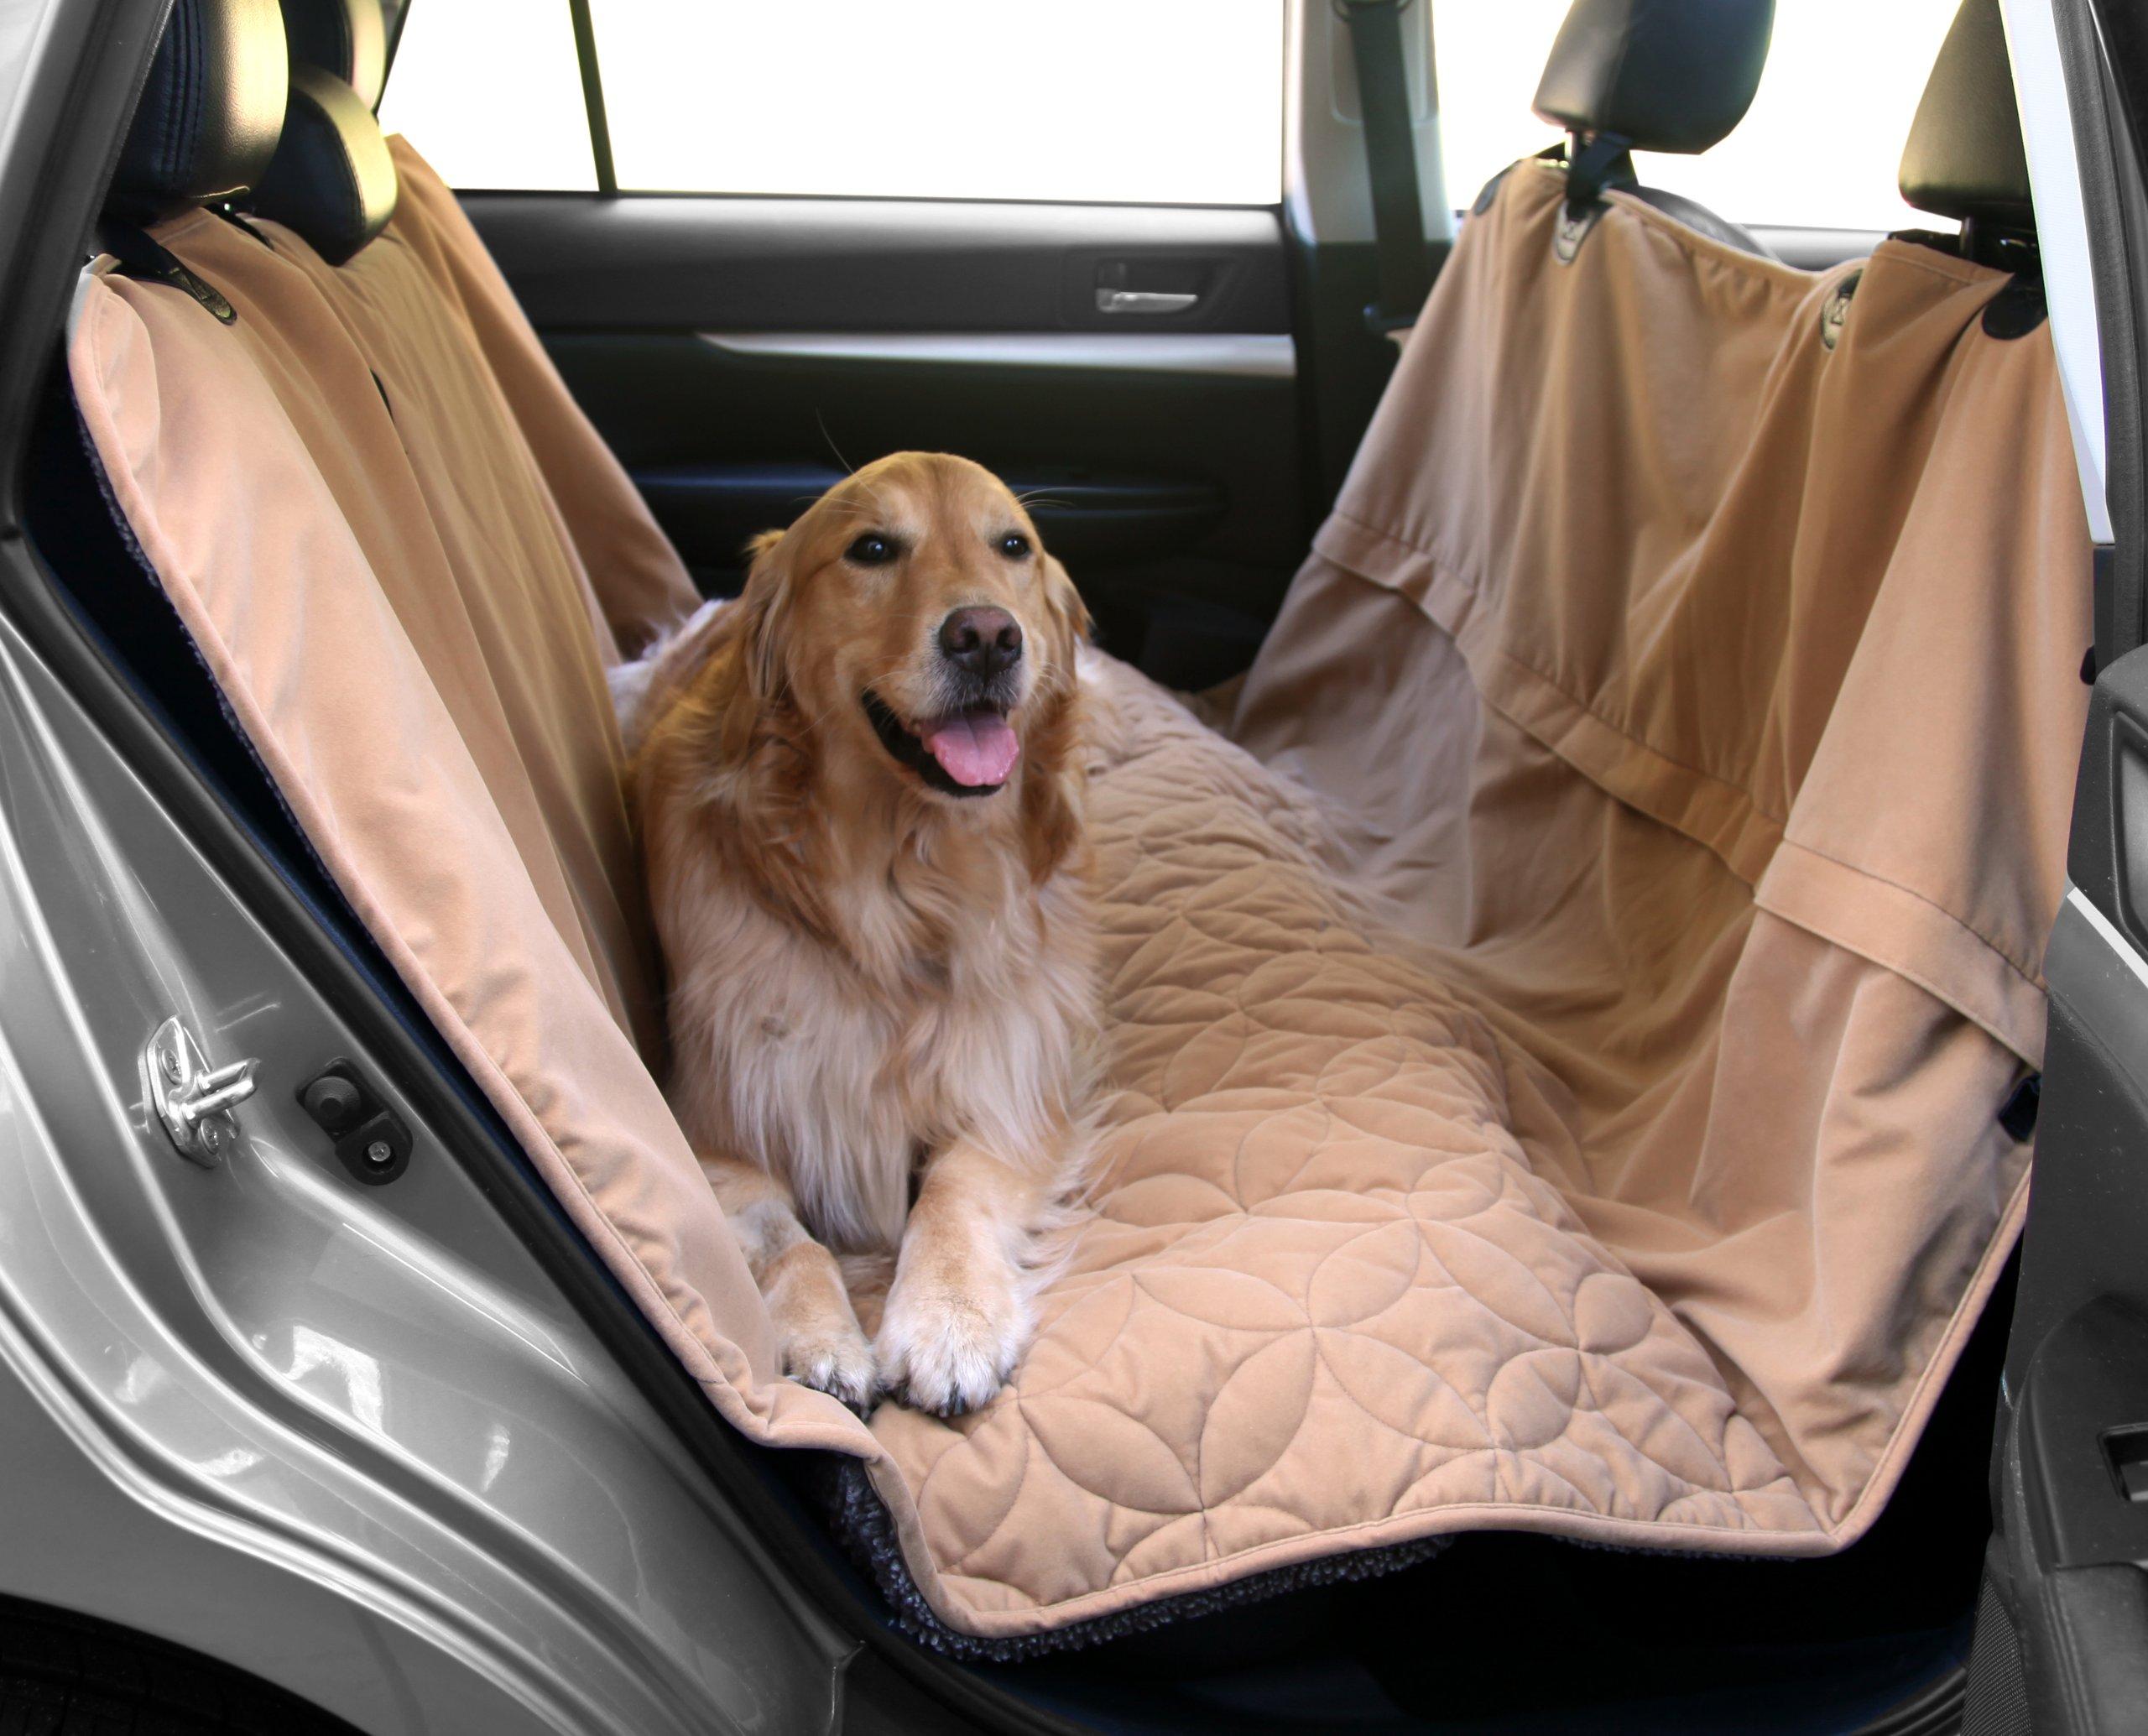 "Floppy Ears Design Waterproof Microfiber Zippered Pet Hammock Seat Cover, Tan, Large 62"" W (across the seats) x 75"""